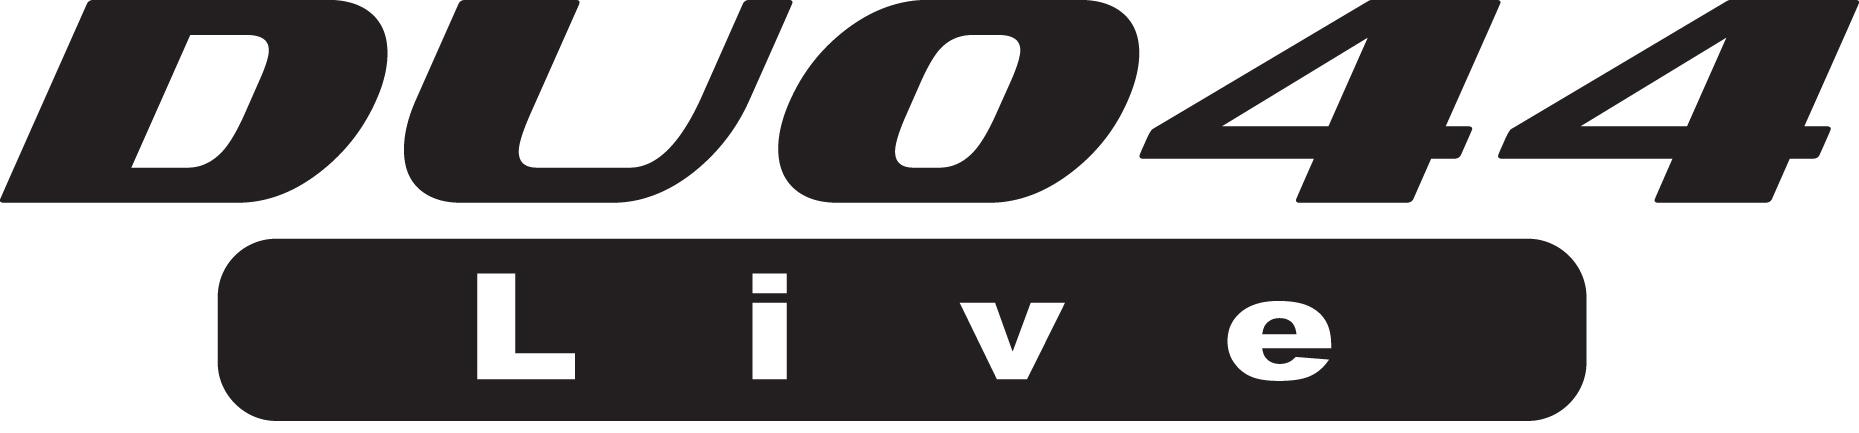 Duo44 Live logo